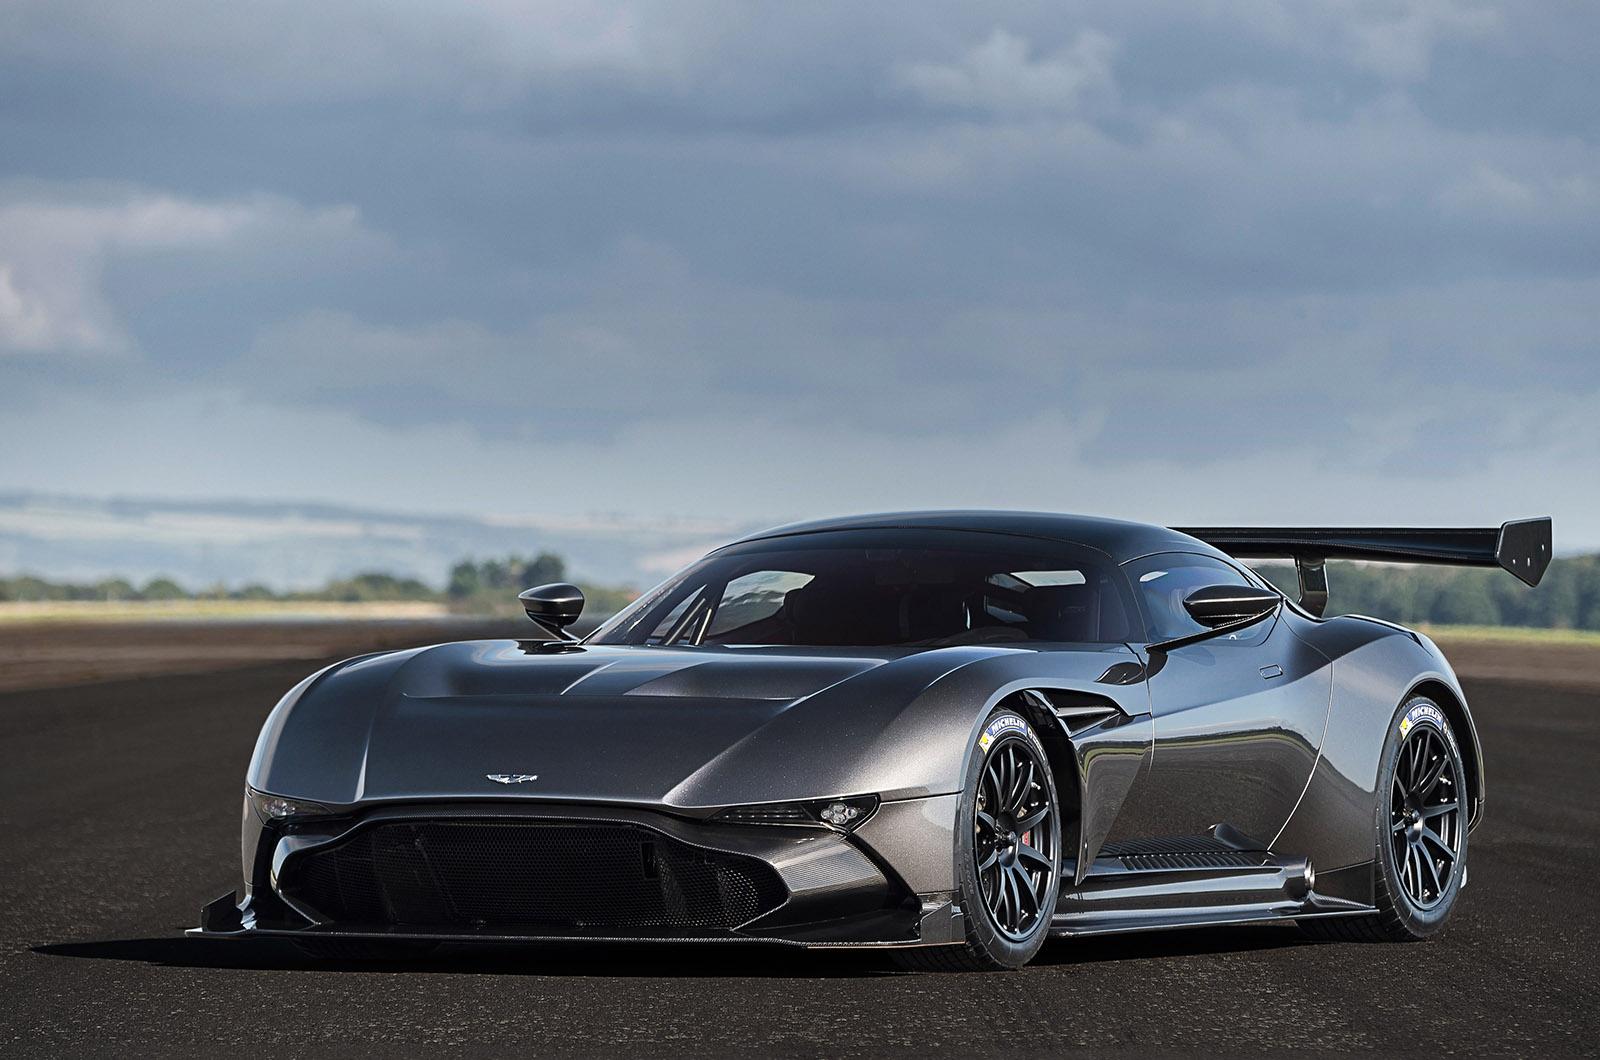 Exclusive Aston Martin Vulcan Gets Road Conversion Kit Autocar